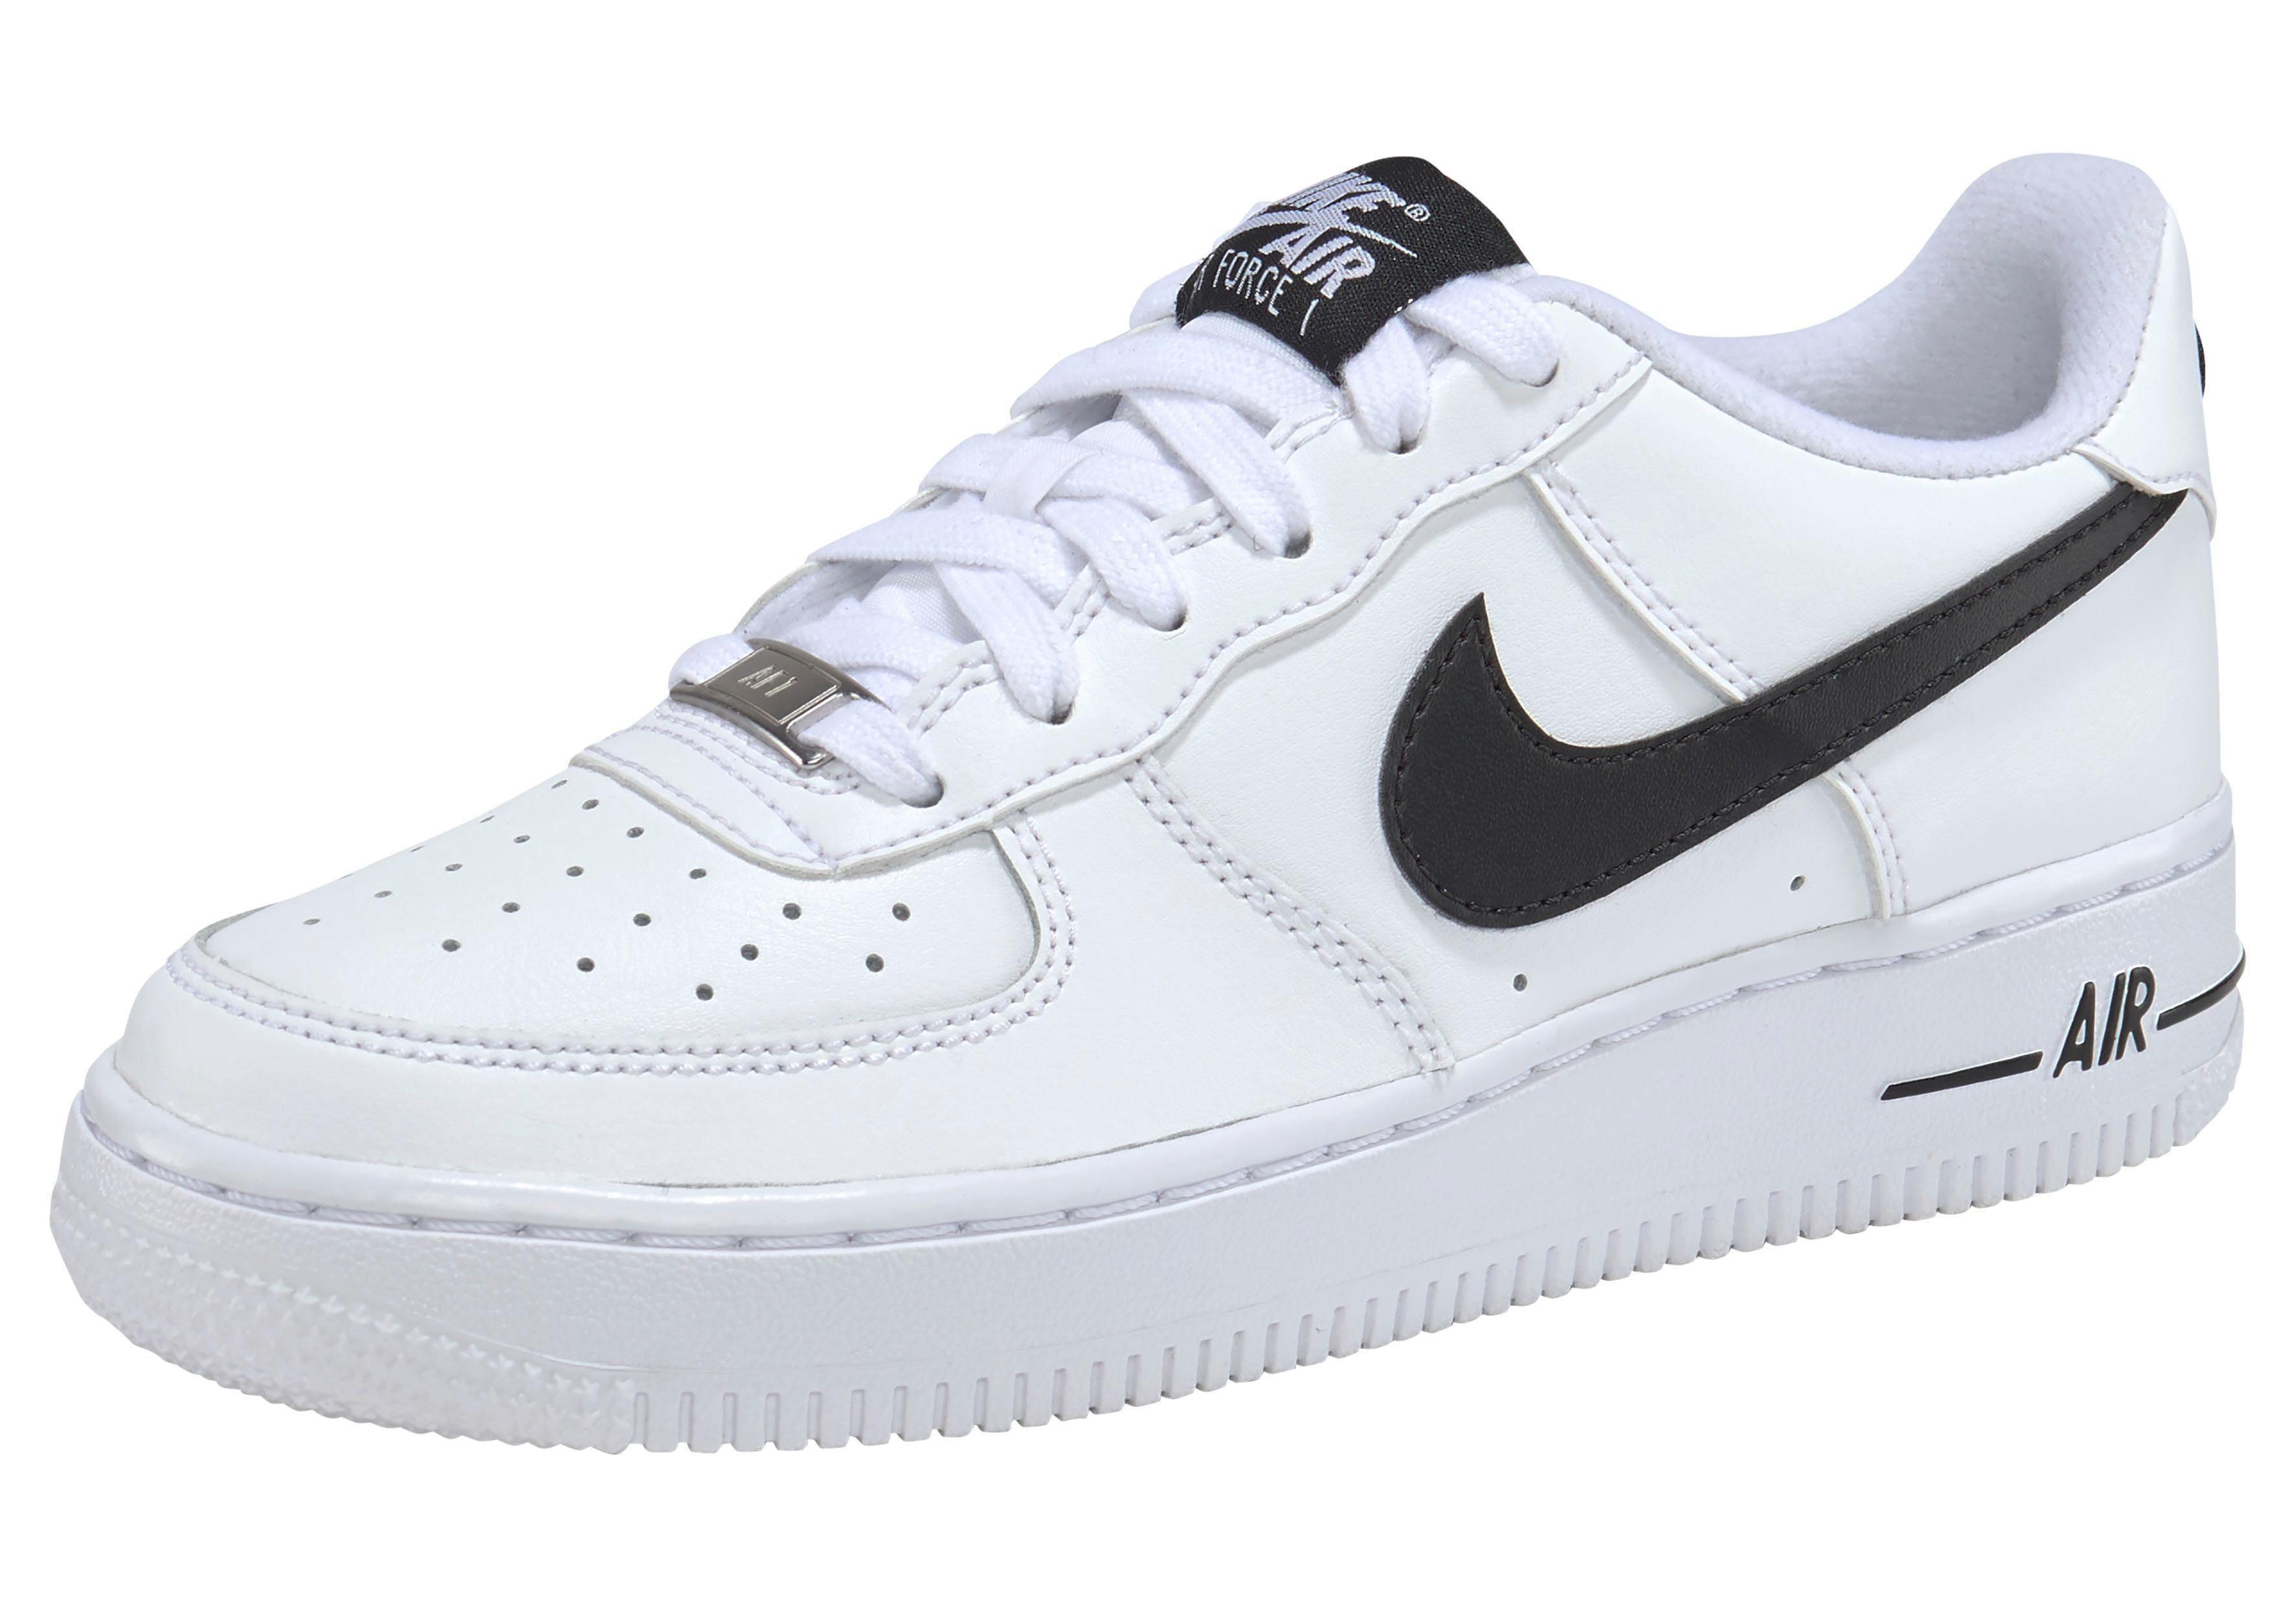 Nike Sportswear »AIR FORCE 1« Sneaker, Modischer Sneaker von Nike Sportswear online kaufen | OTTO